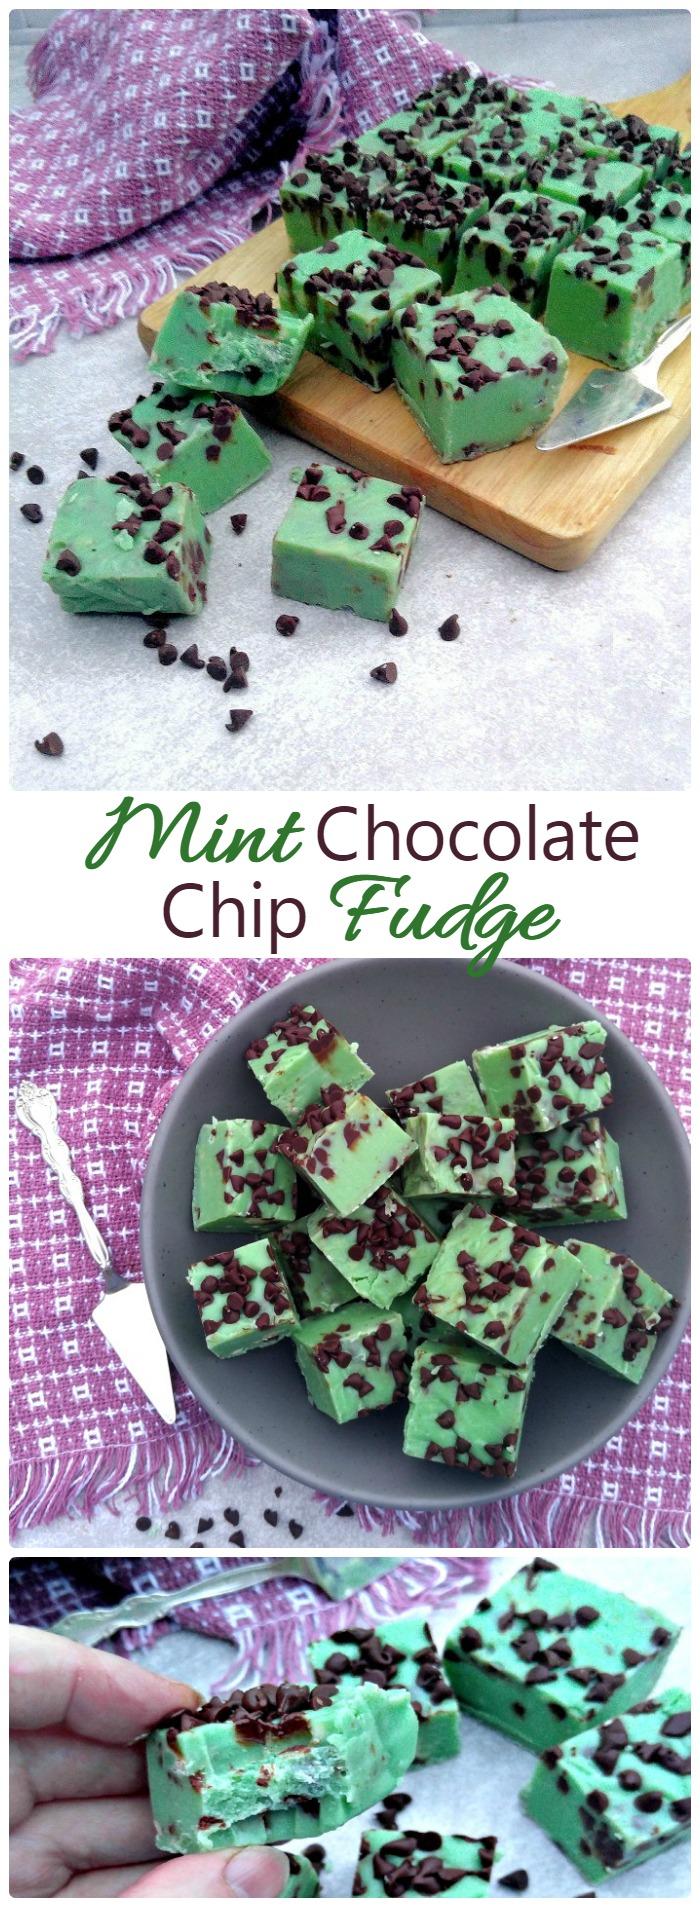 Mint Chocolate Chip Fudge